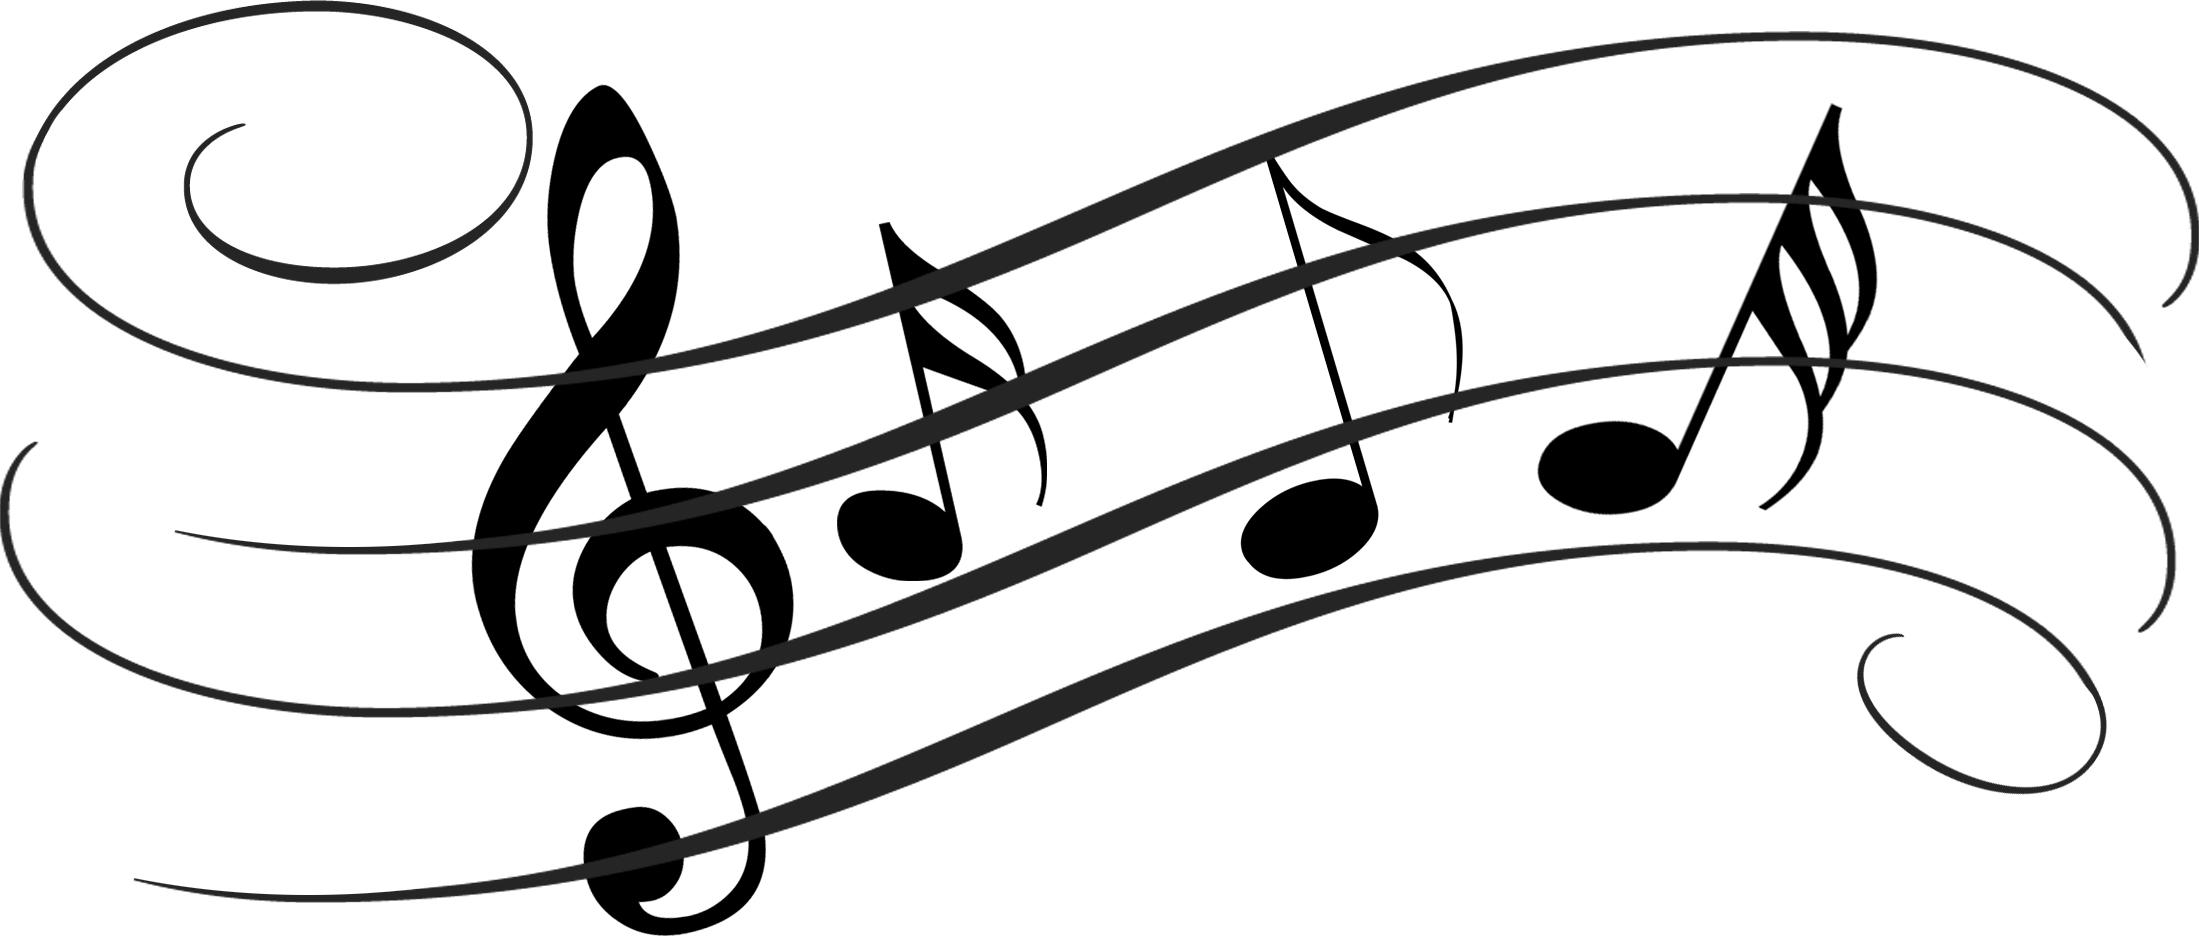 2016 Aldwark NOTES LIVE Arms